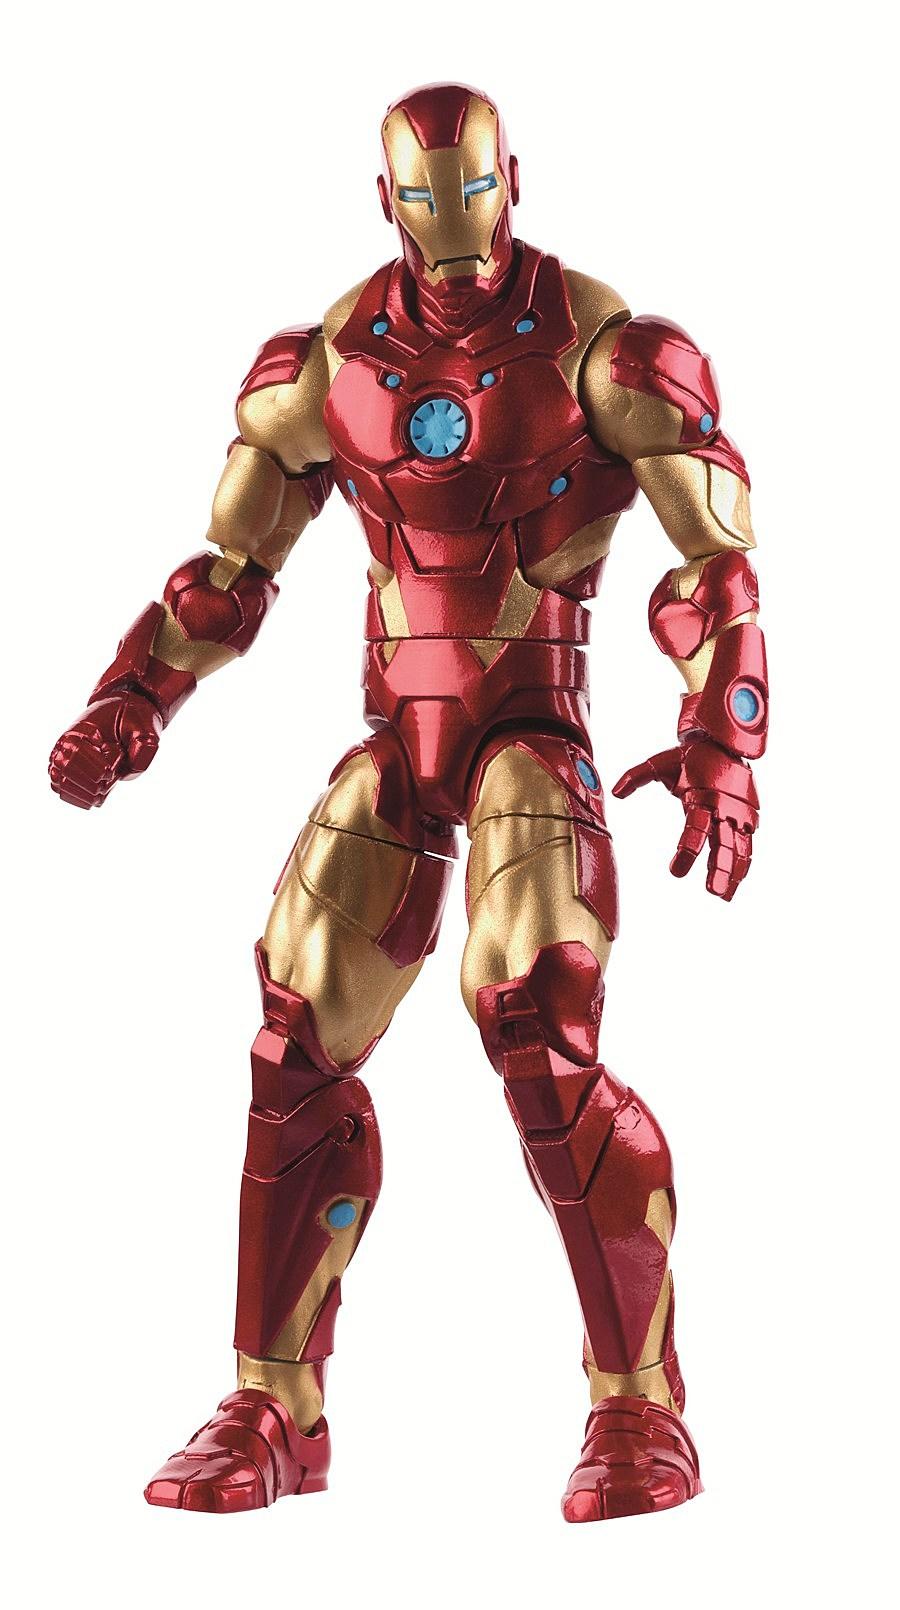 Toys For Gentleman : Toy fair hasbro s official 'iron man ′ action